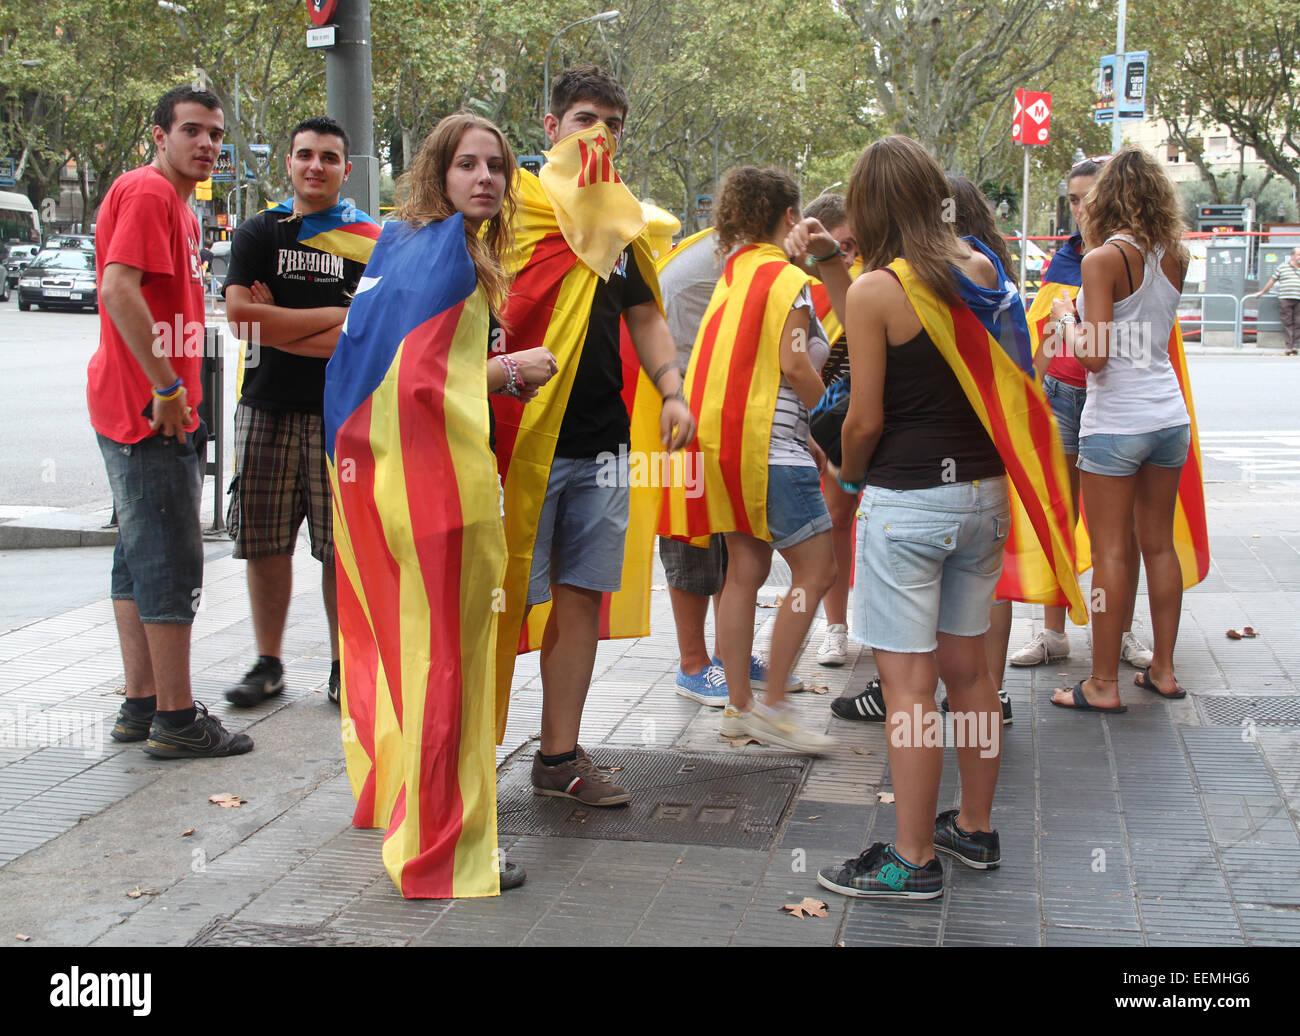 Les jeunes catalans célébrant la Journée nationale de la Catalogne (Diada Nacional de Catalunya) Photo Stock